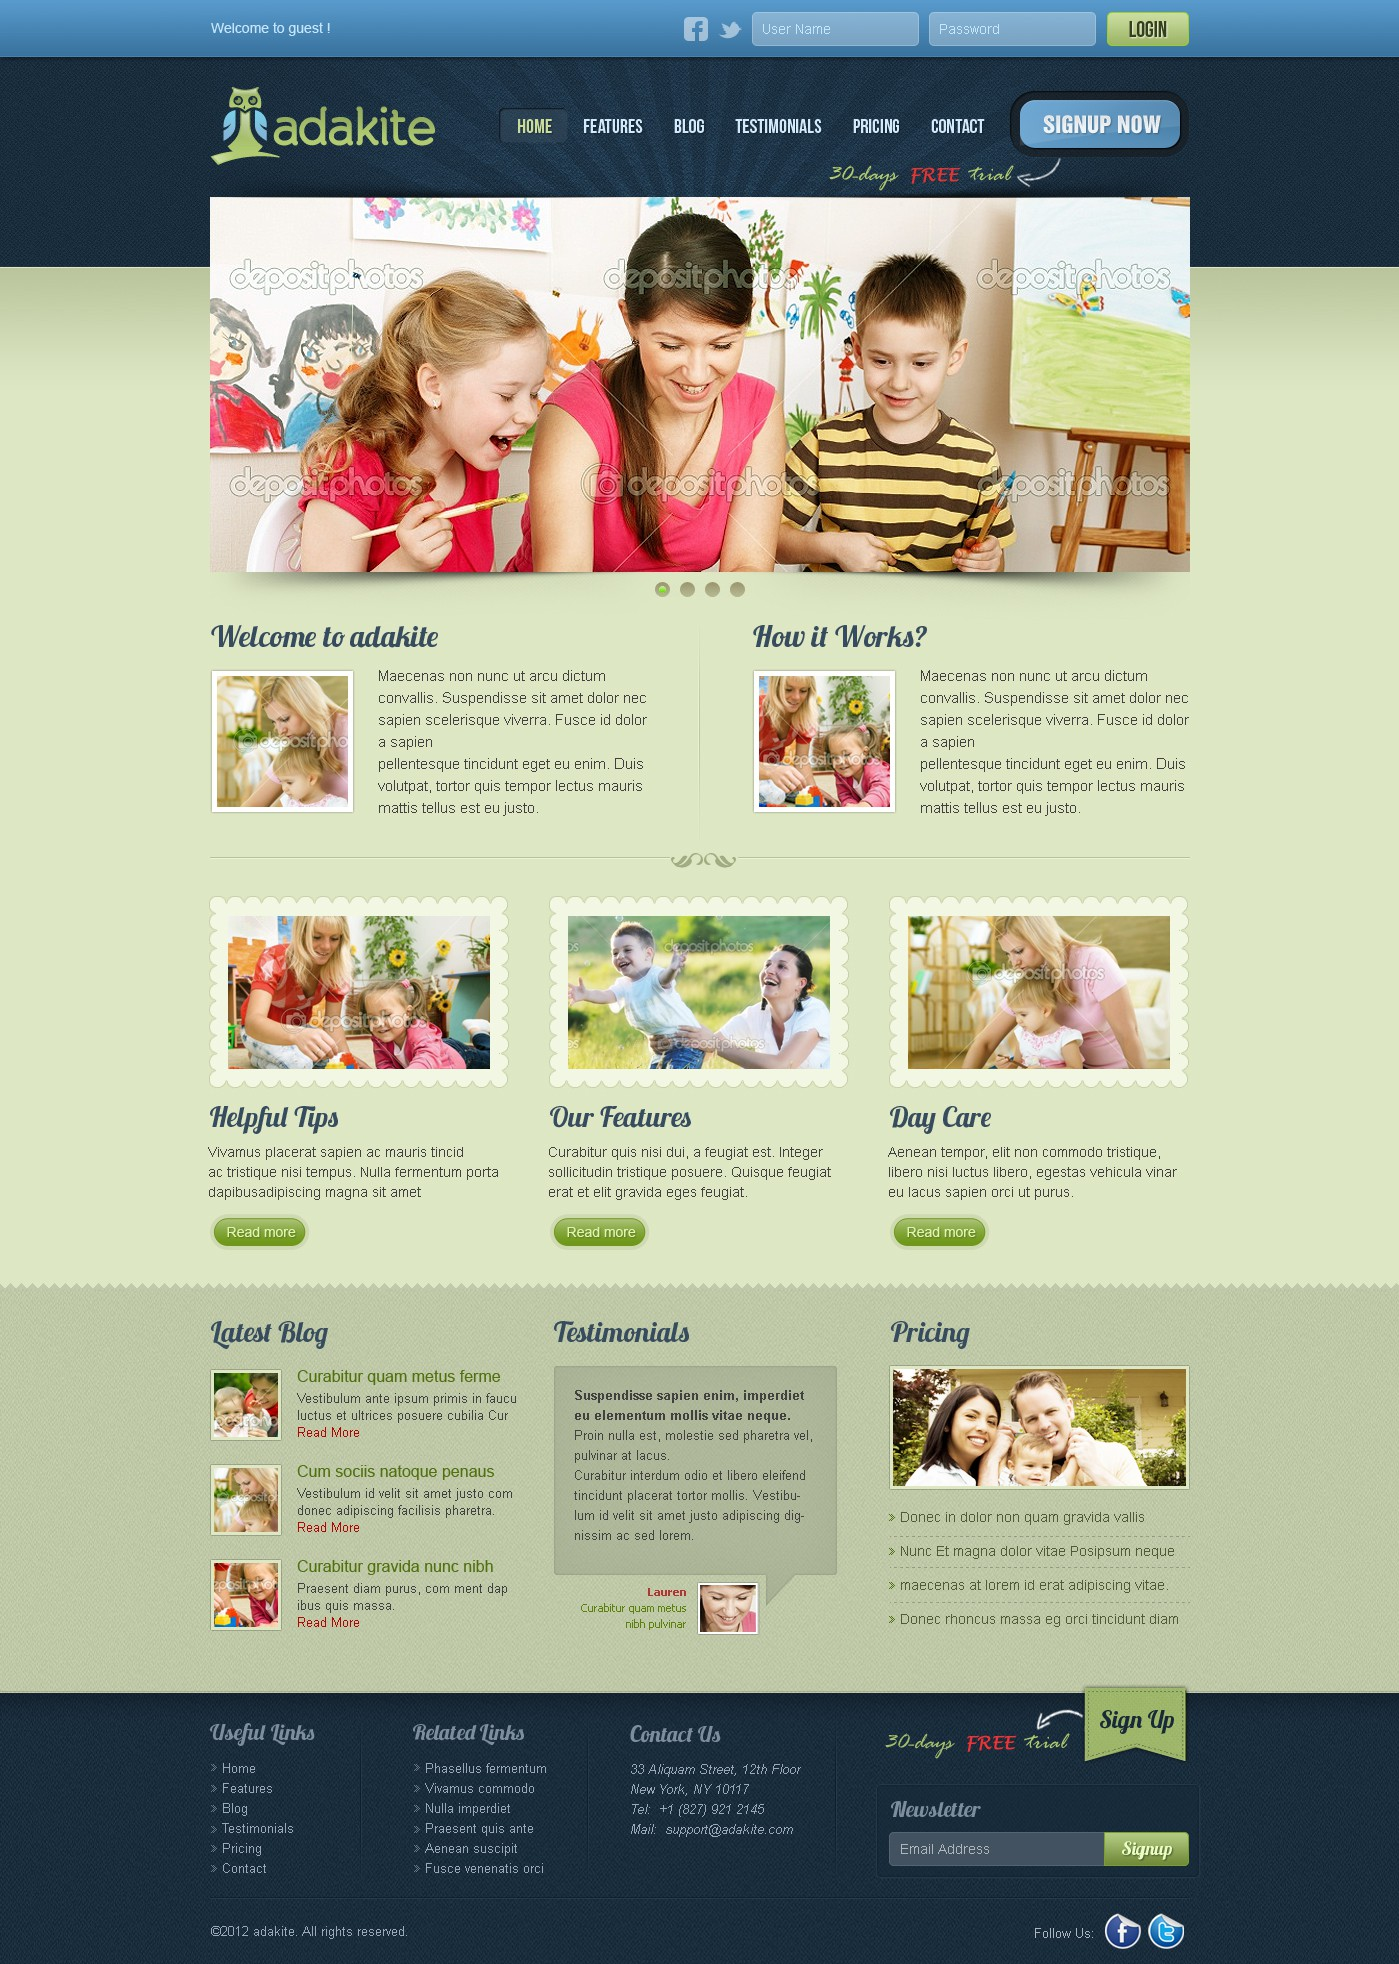 adakite needs a new website design